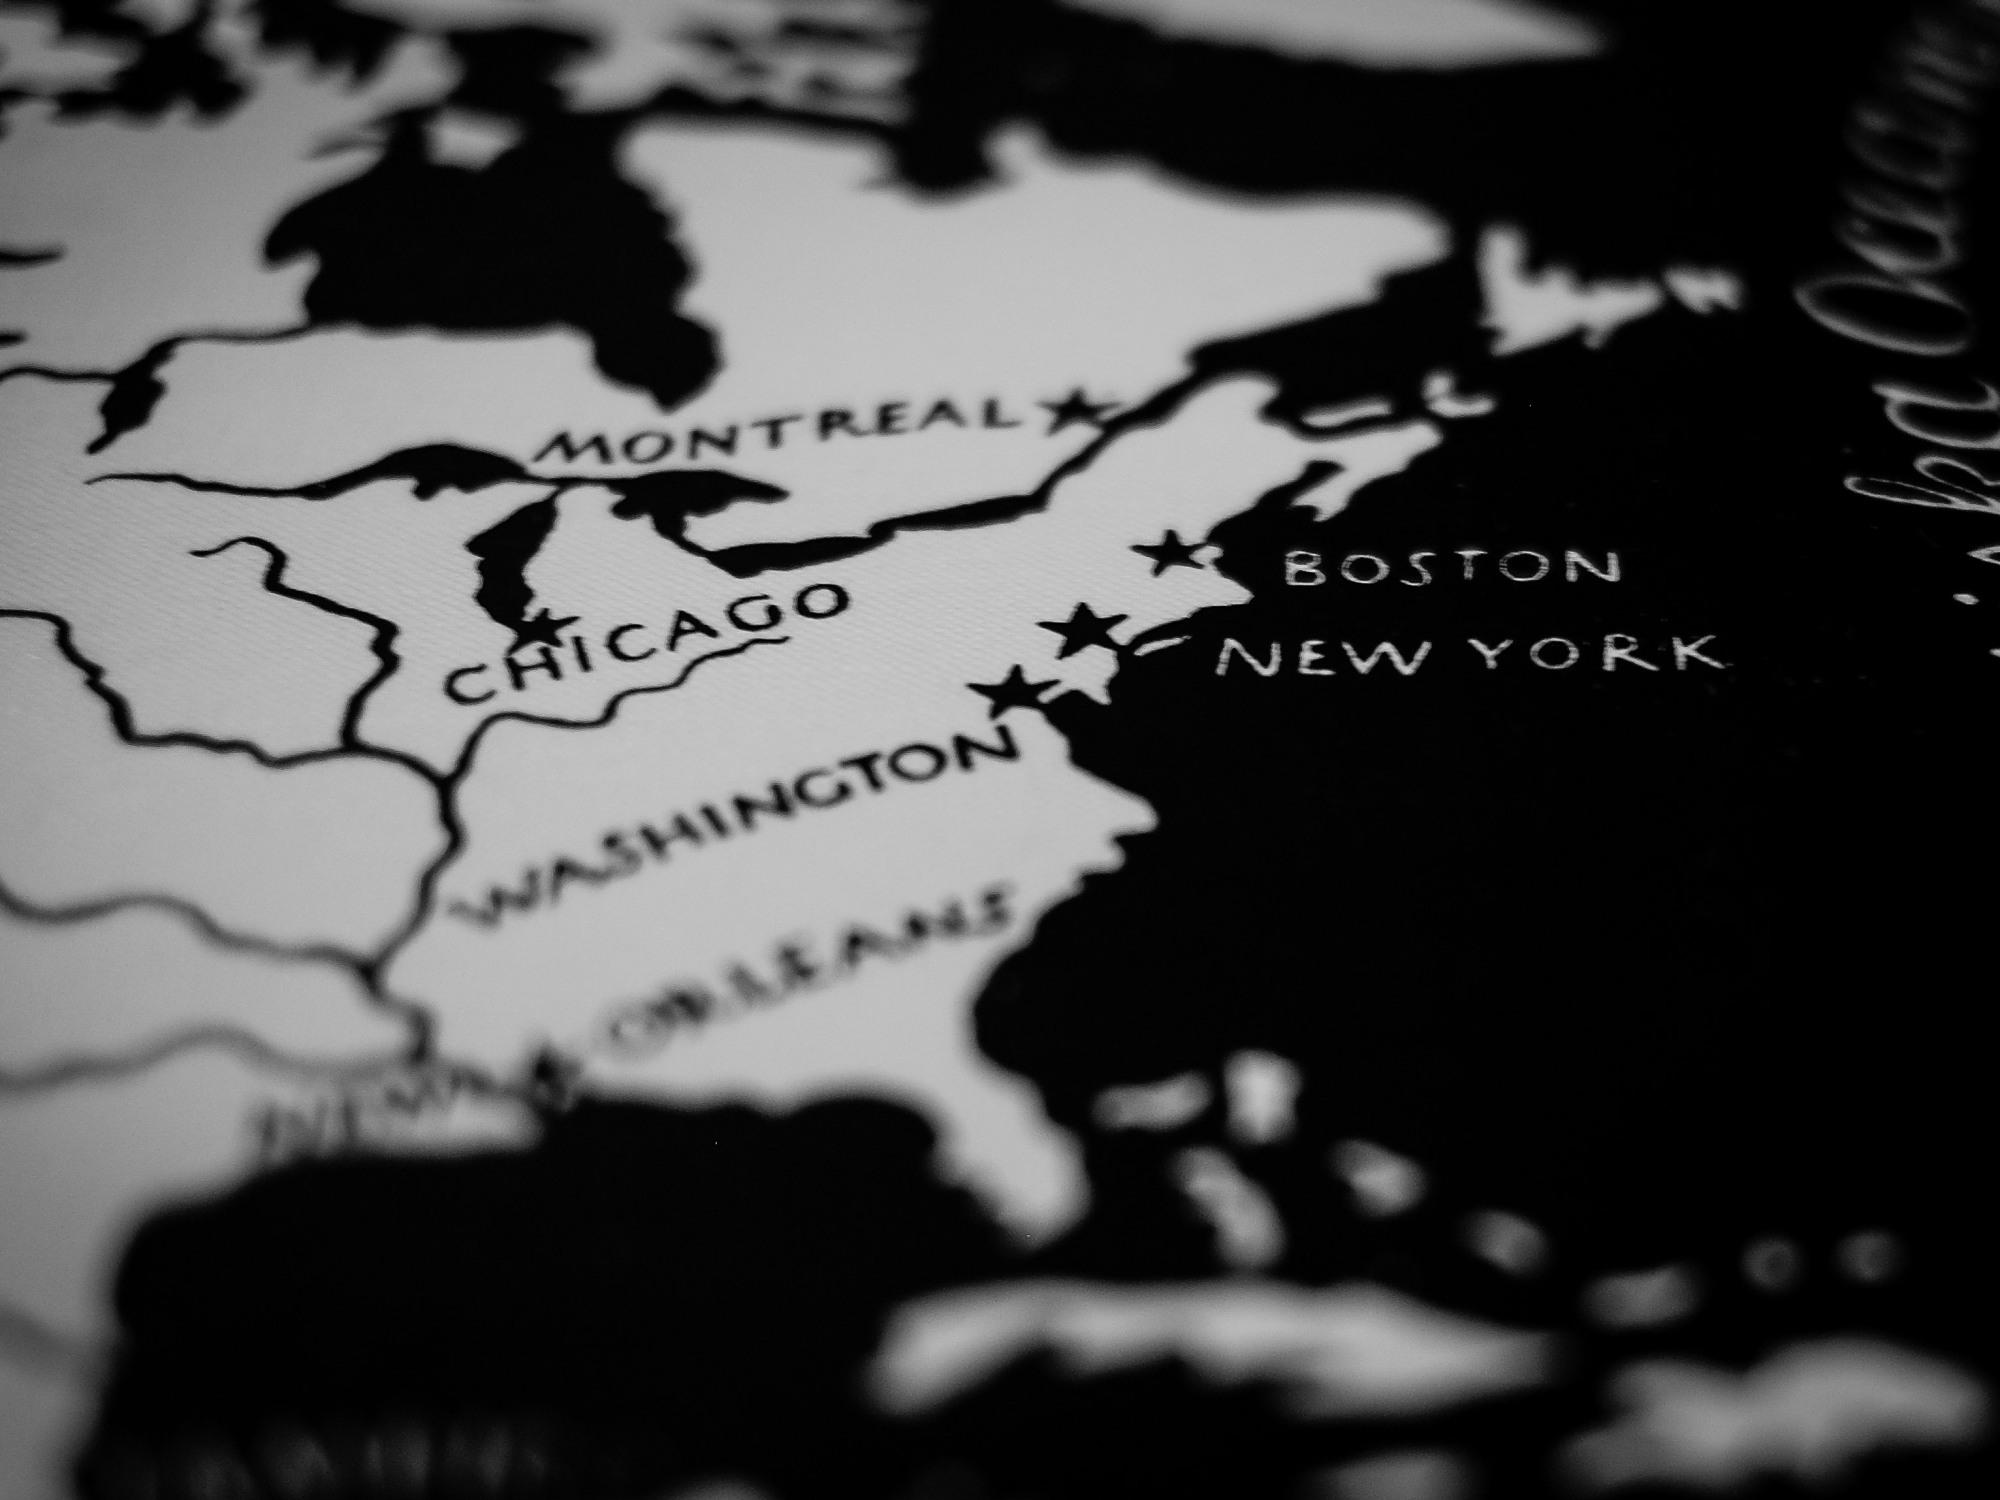 USA map, Boston, New York